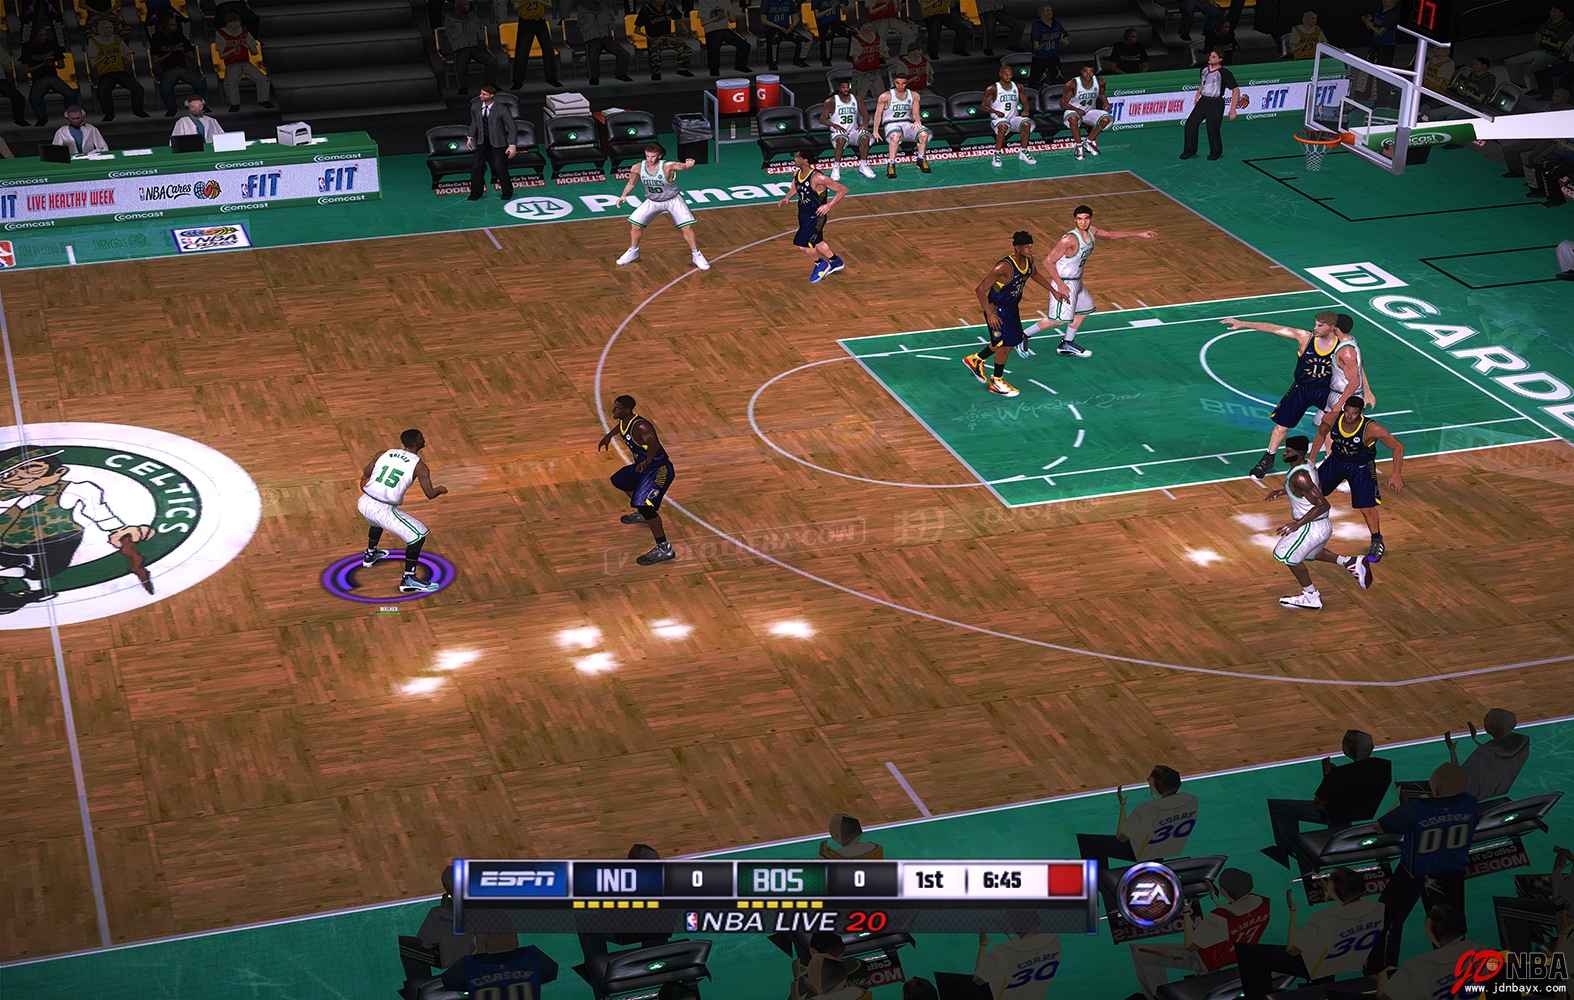 nbalive08名单_【08 Mod】 NBA LIVE 20 - NBA LIVE 08 - NBA - Powered by Discuz!